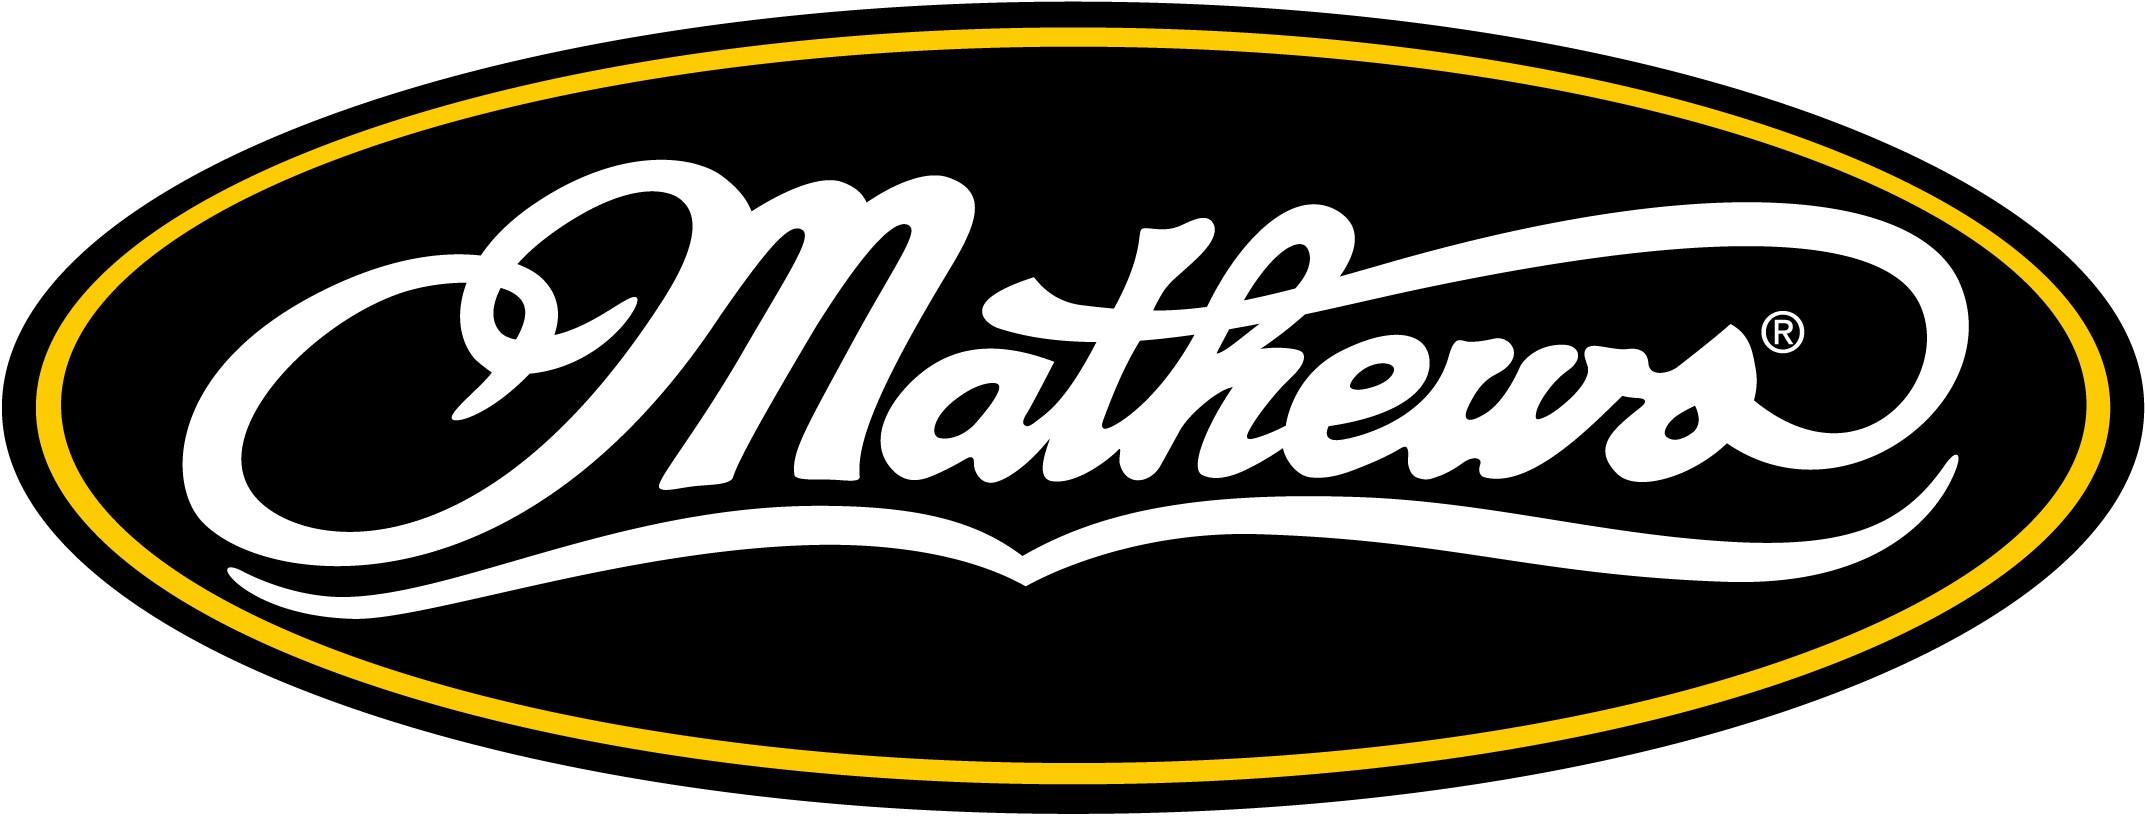 Mathews® Introduces 2019 VERTIX™ Bow in Realtree EDGE™ – POMA